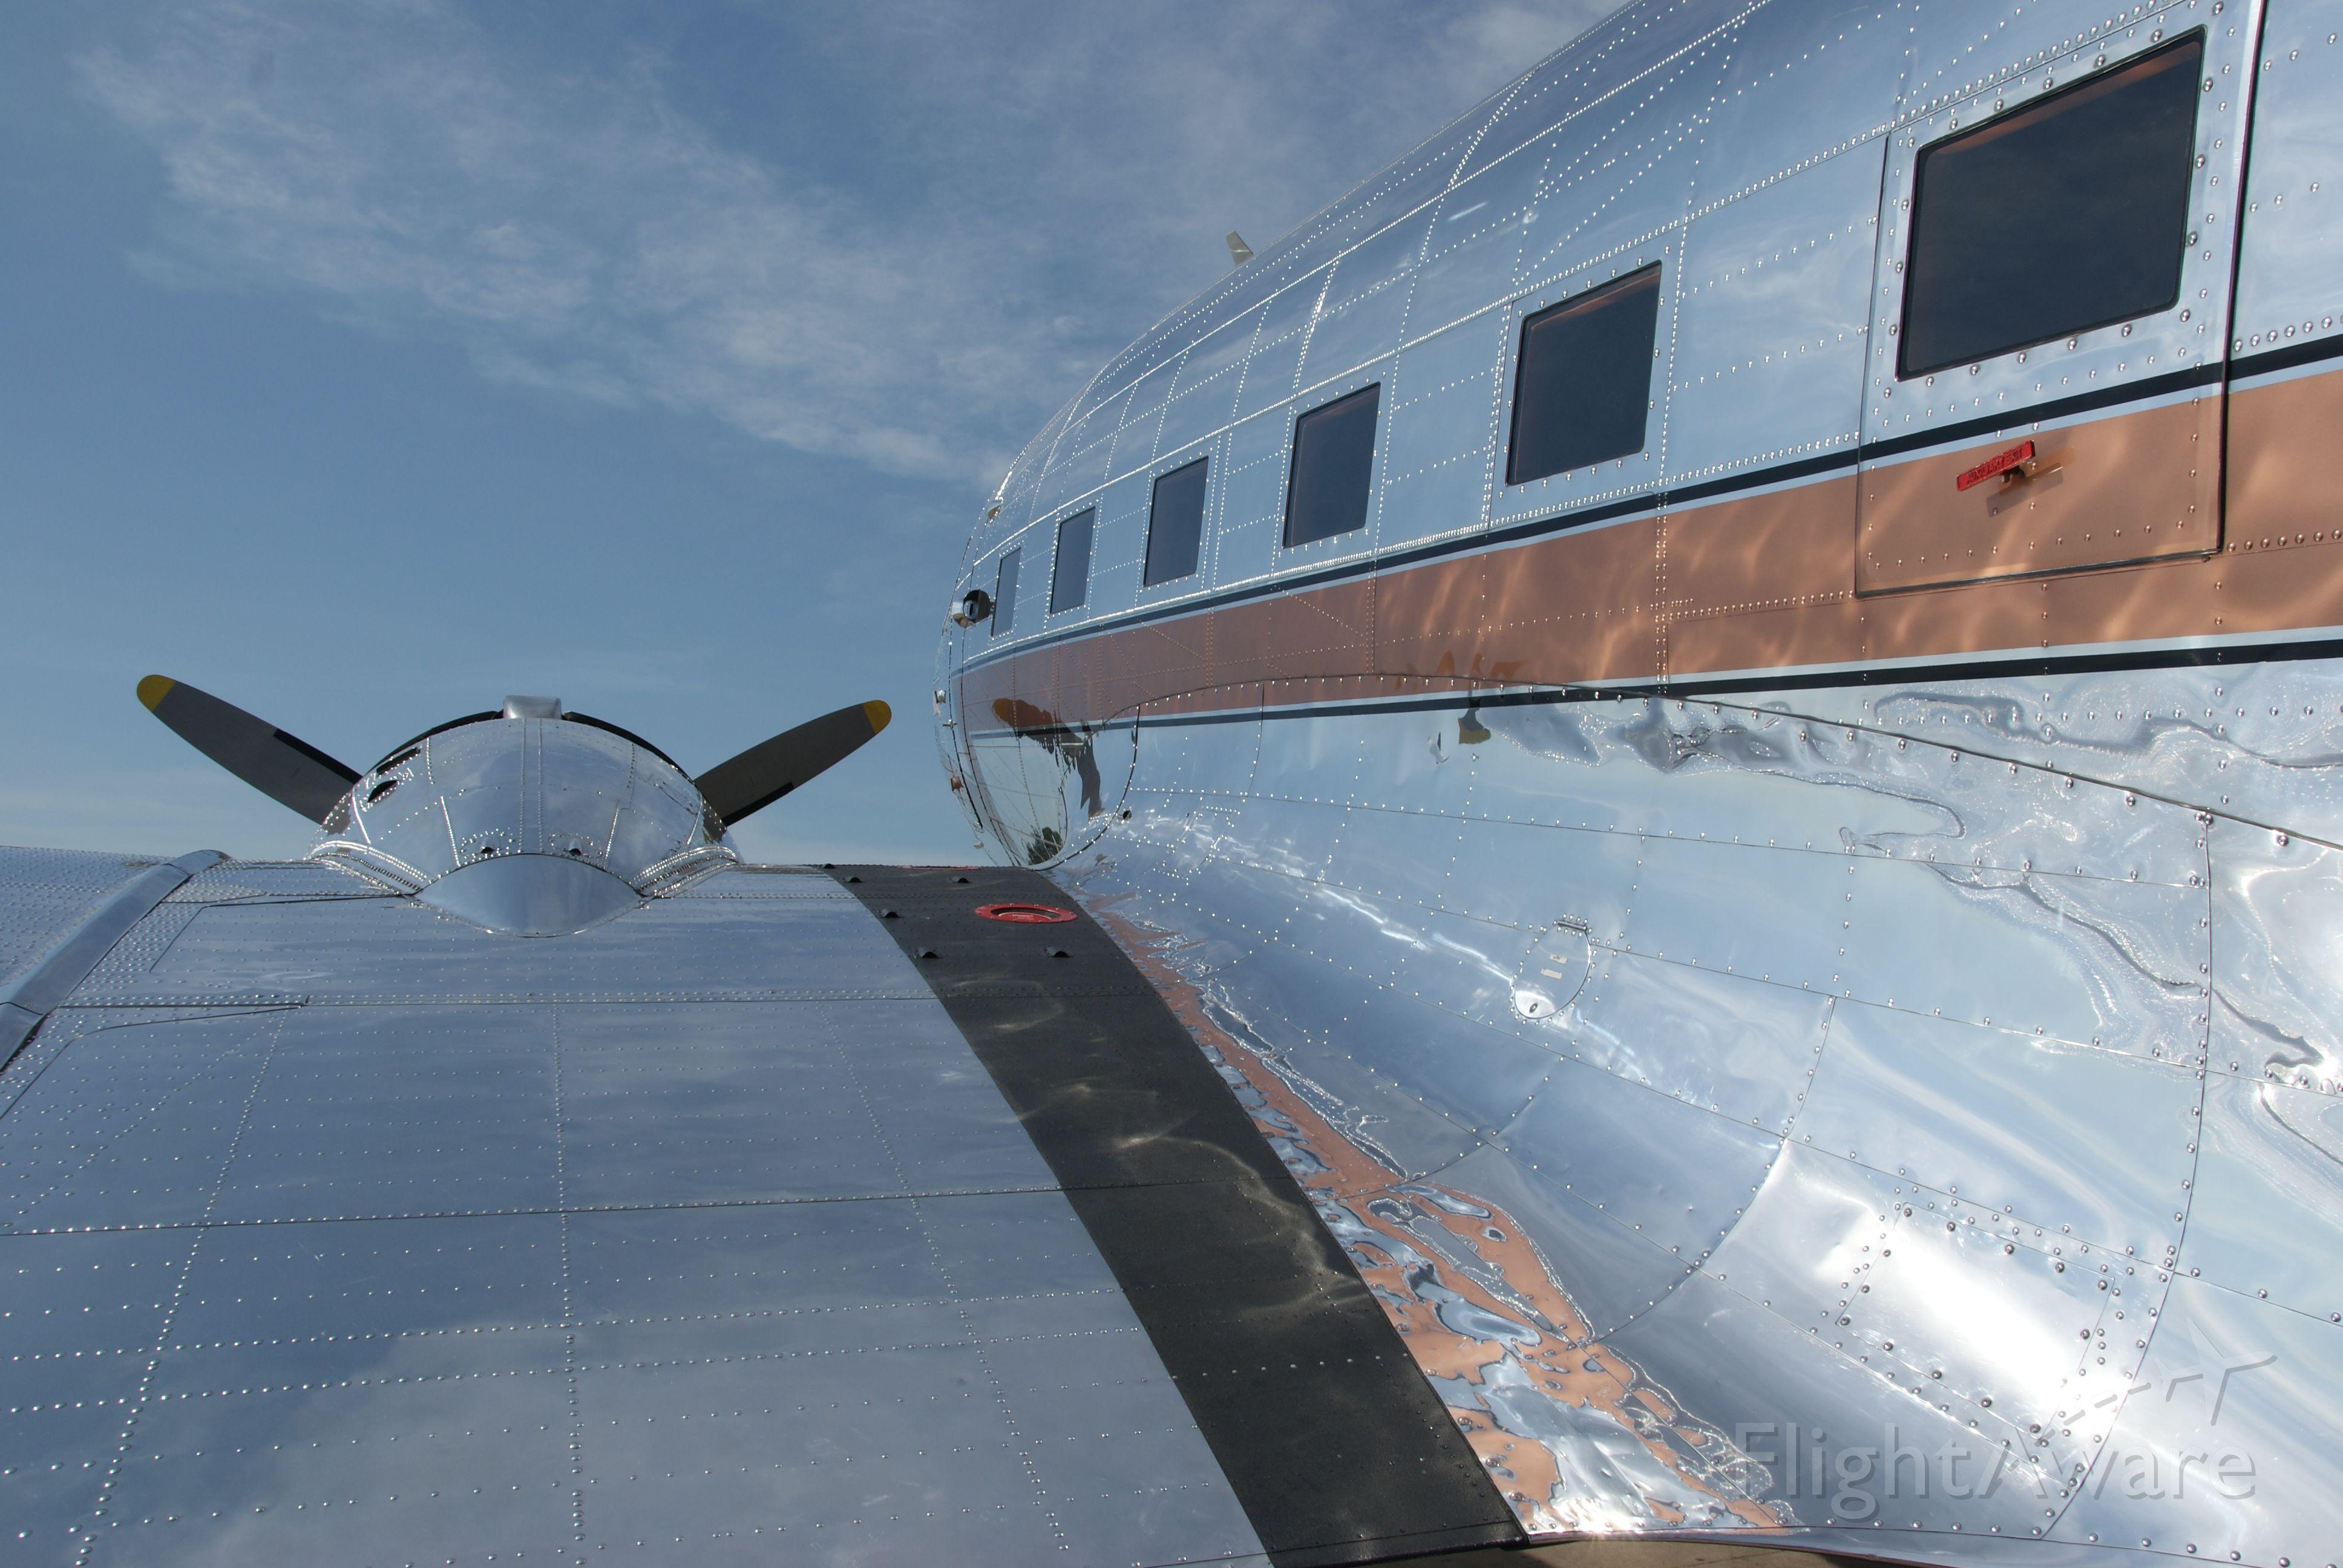 Douglas DC-3 (N3006) - Esther May in shining glory.